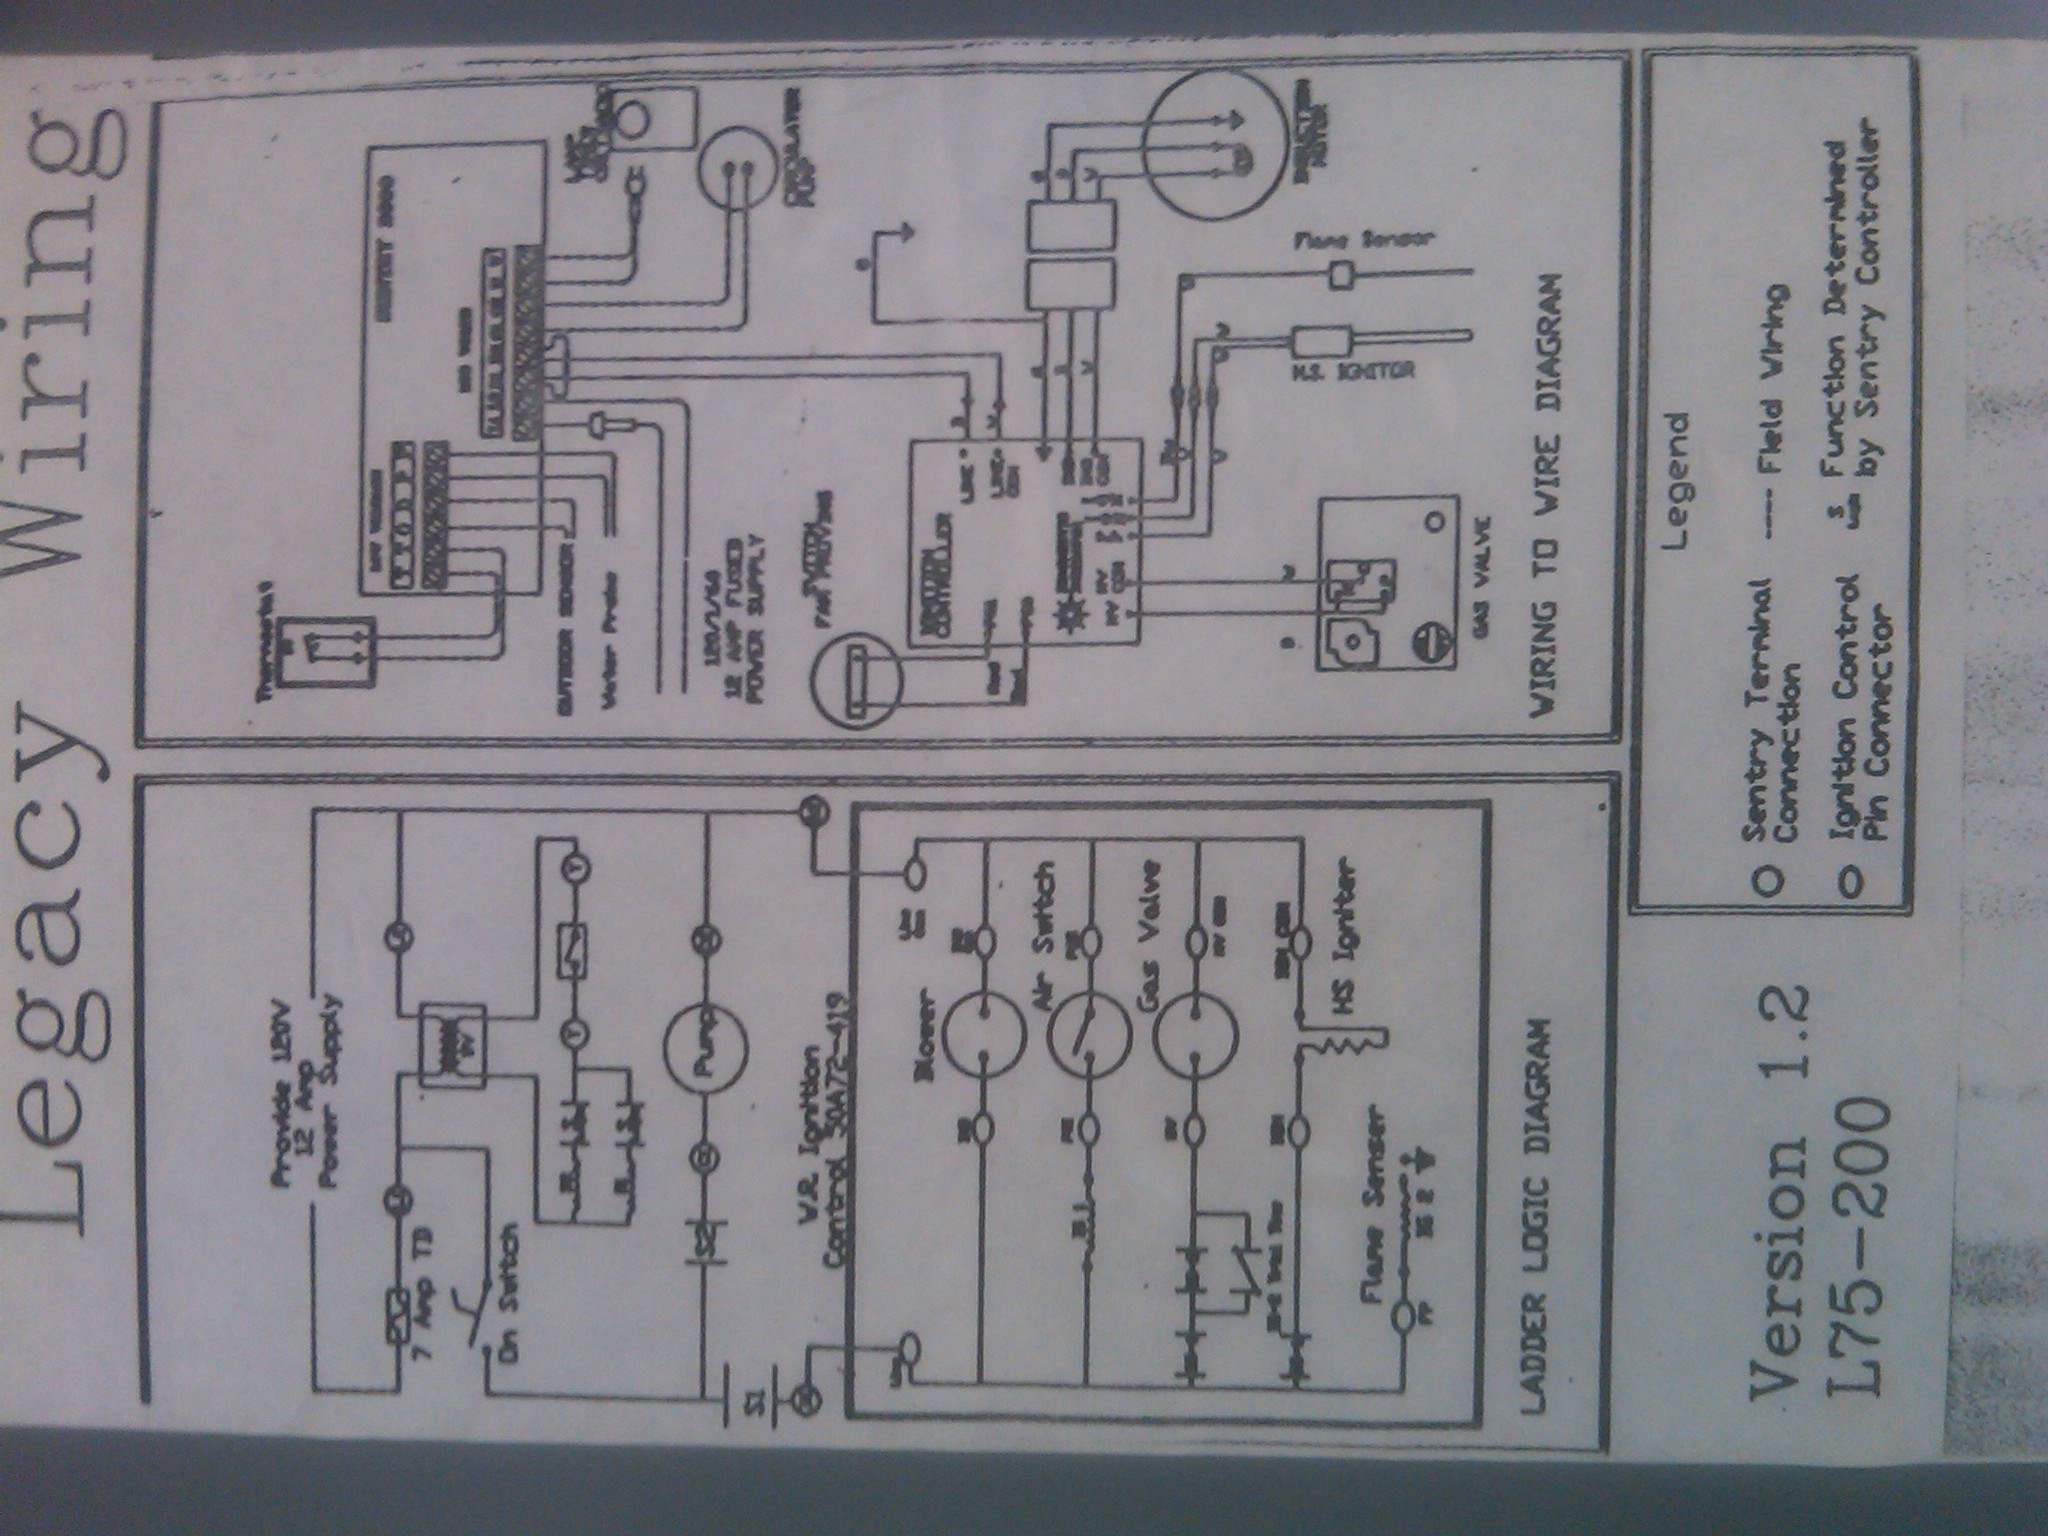 Boiler Oil Burnham V83h Wiring Diagram Pump Parts 2048x1536